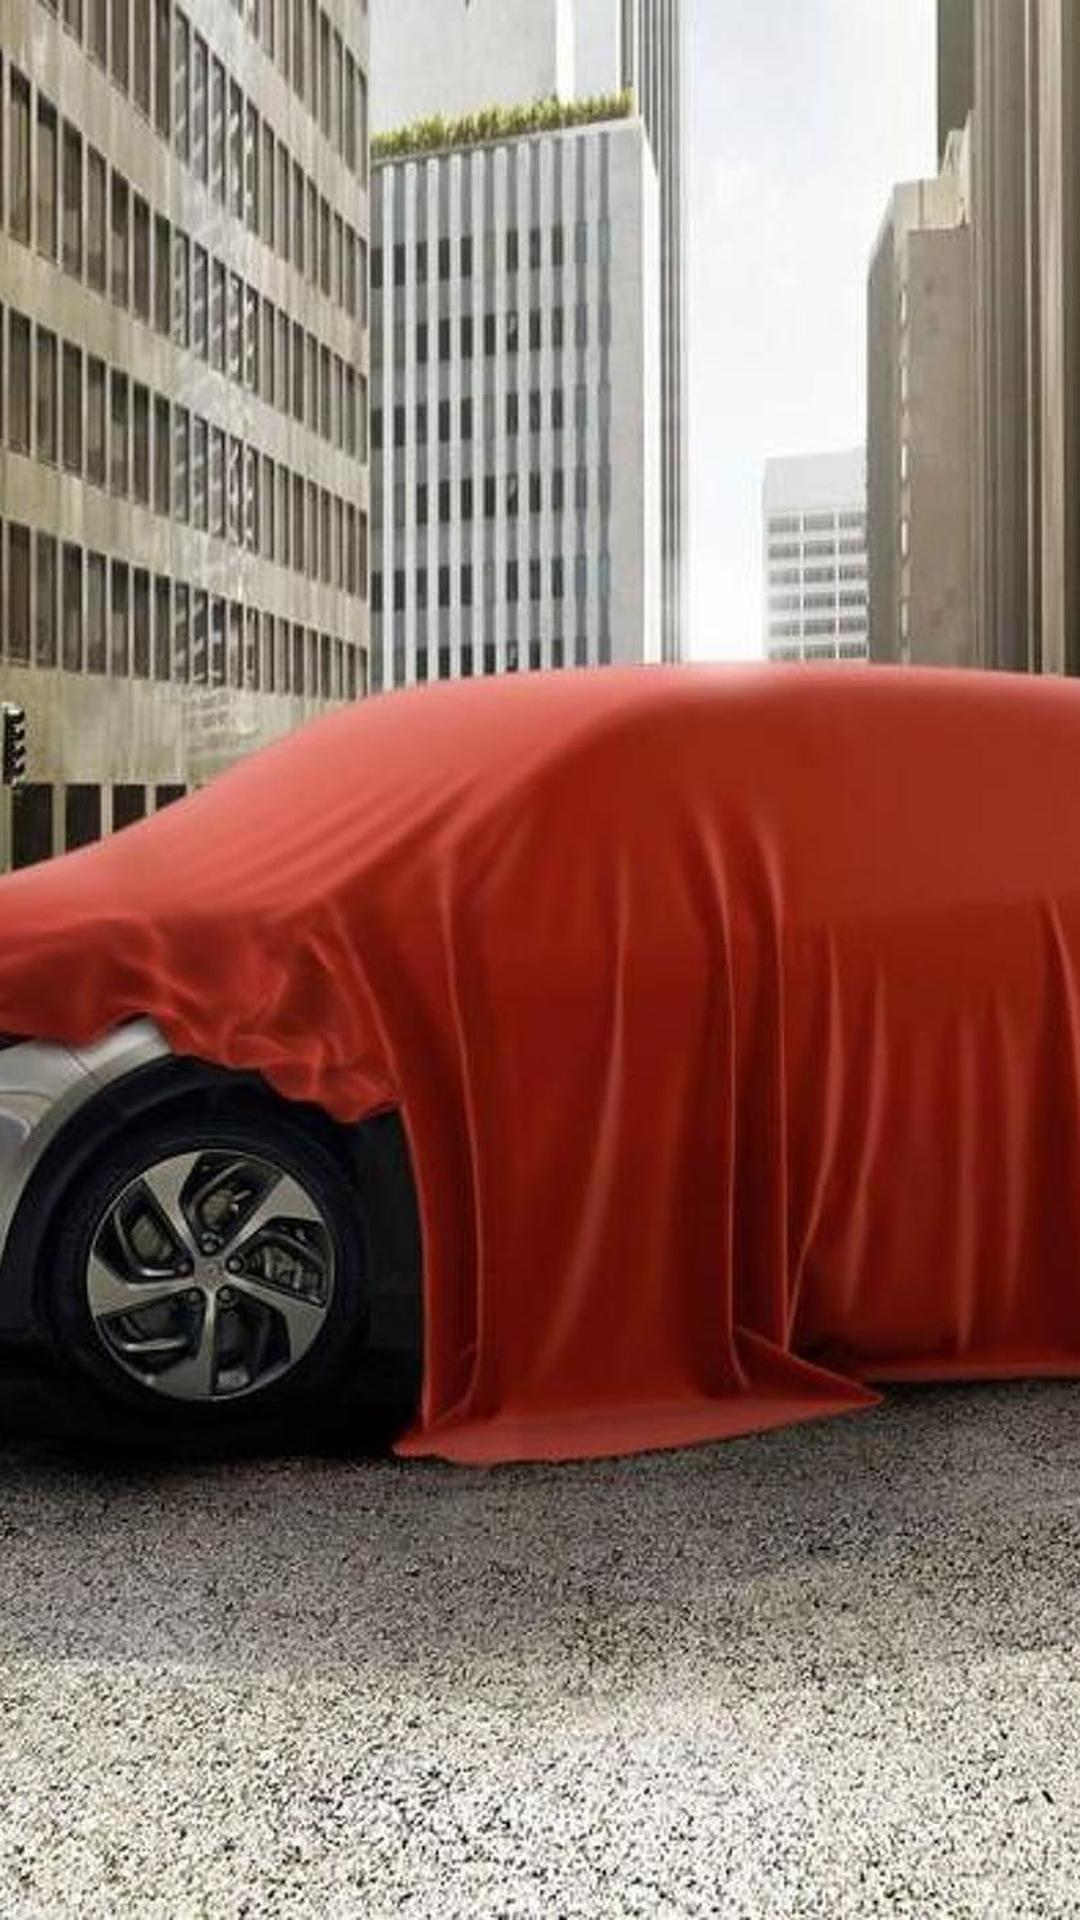 Hyundai Tucson / ix35 teased again ahead of Geneva debut